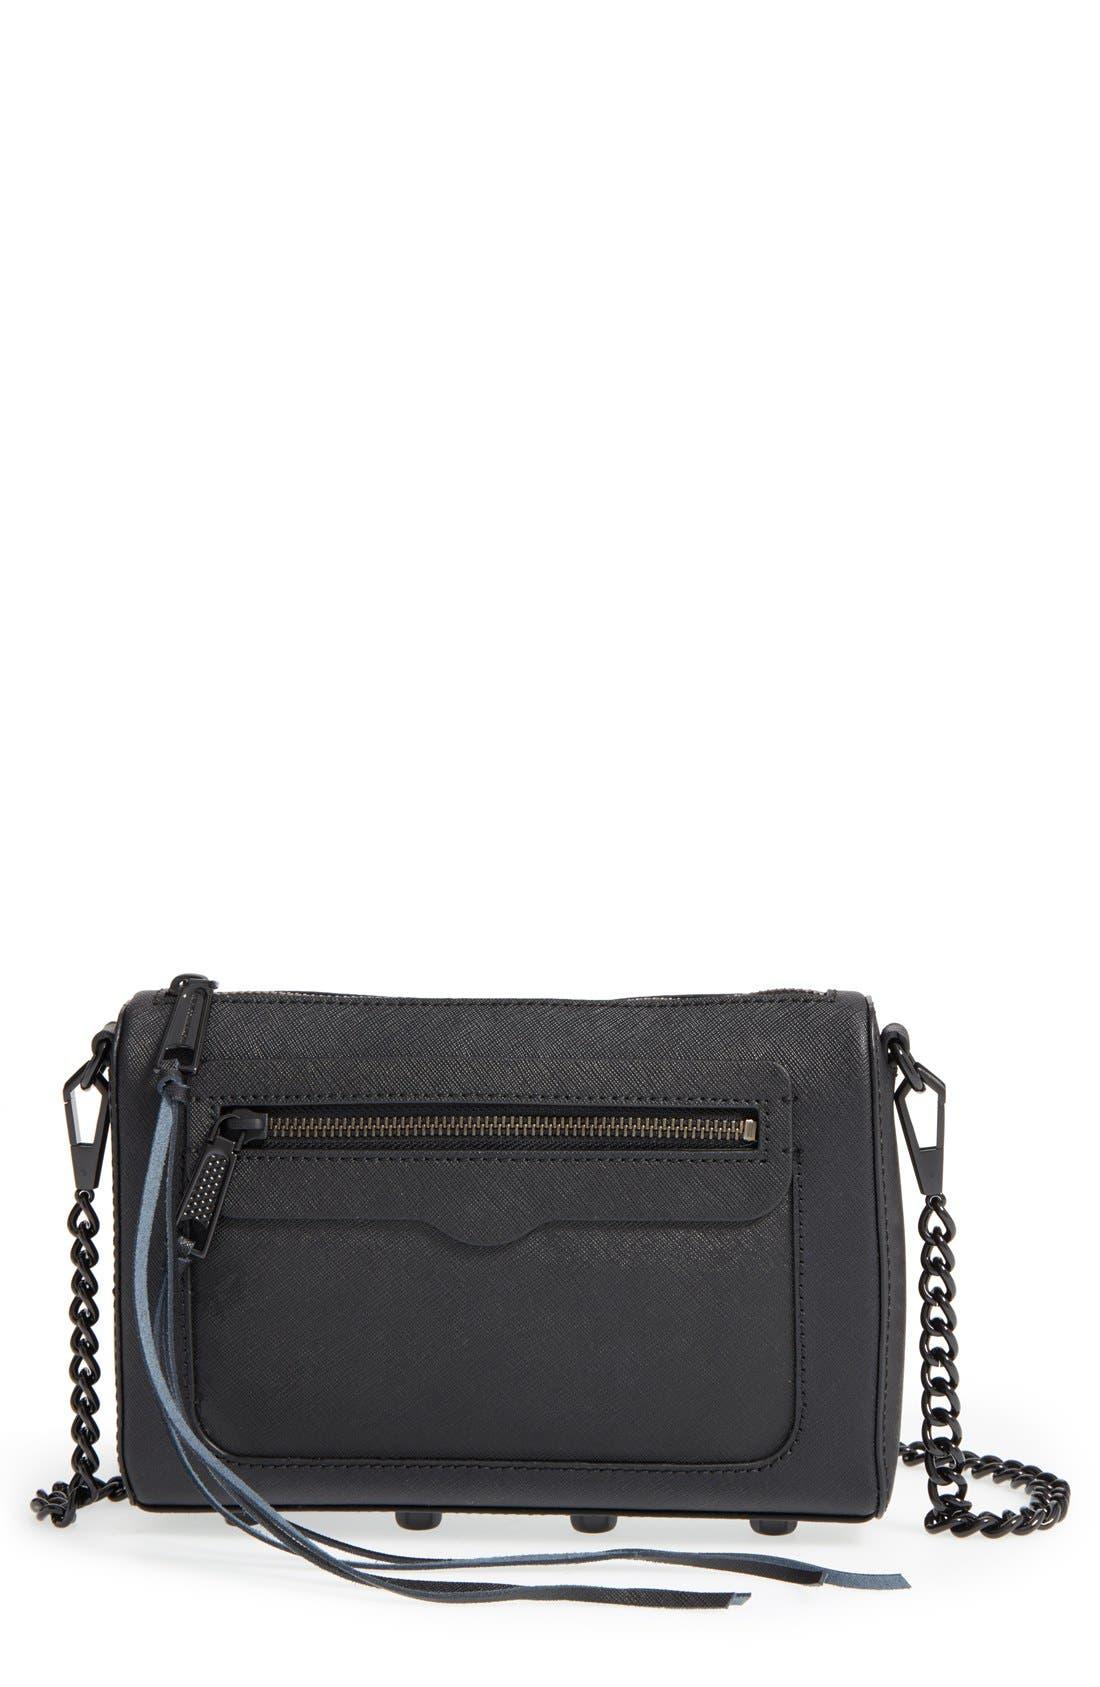 'Avery' Crossbody Bag,                         Main,                         color, Black/ Black Hrdwr